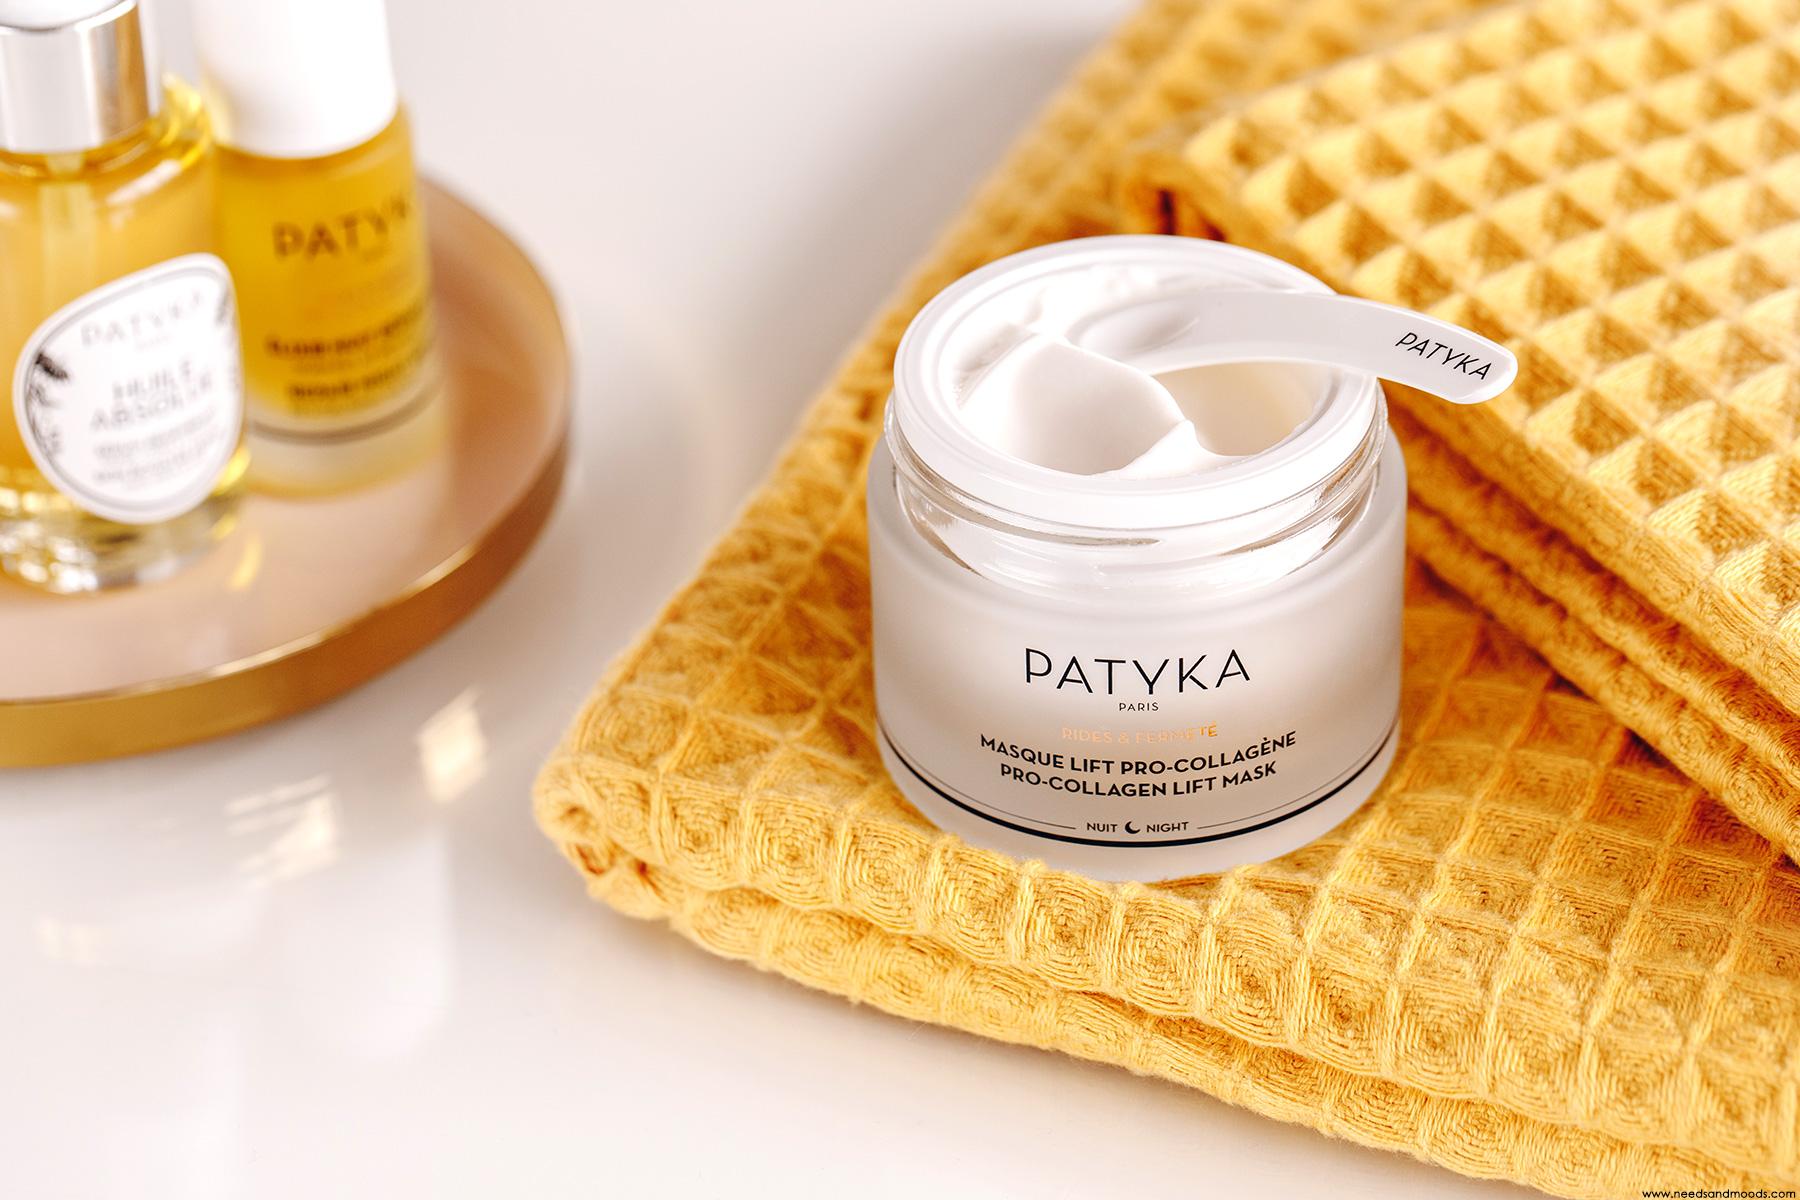 patyka masque lift pro-collagene